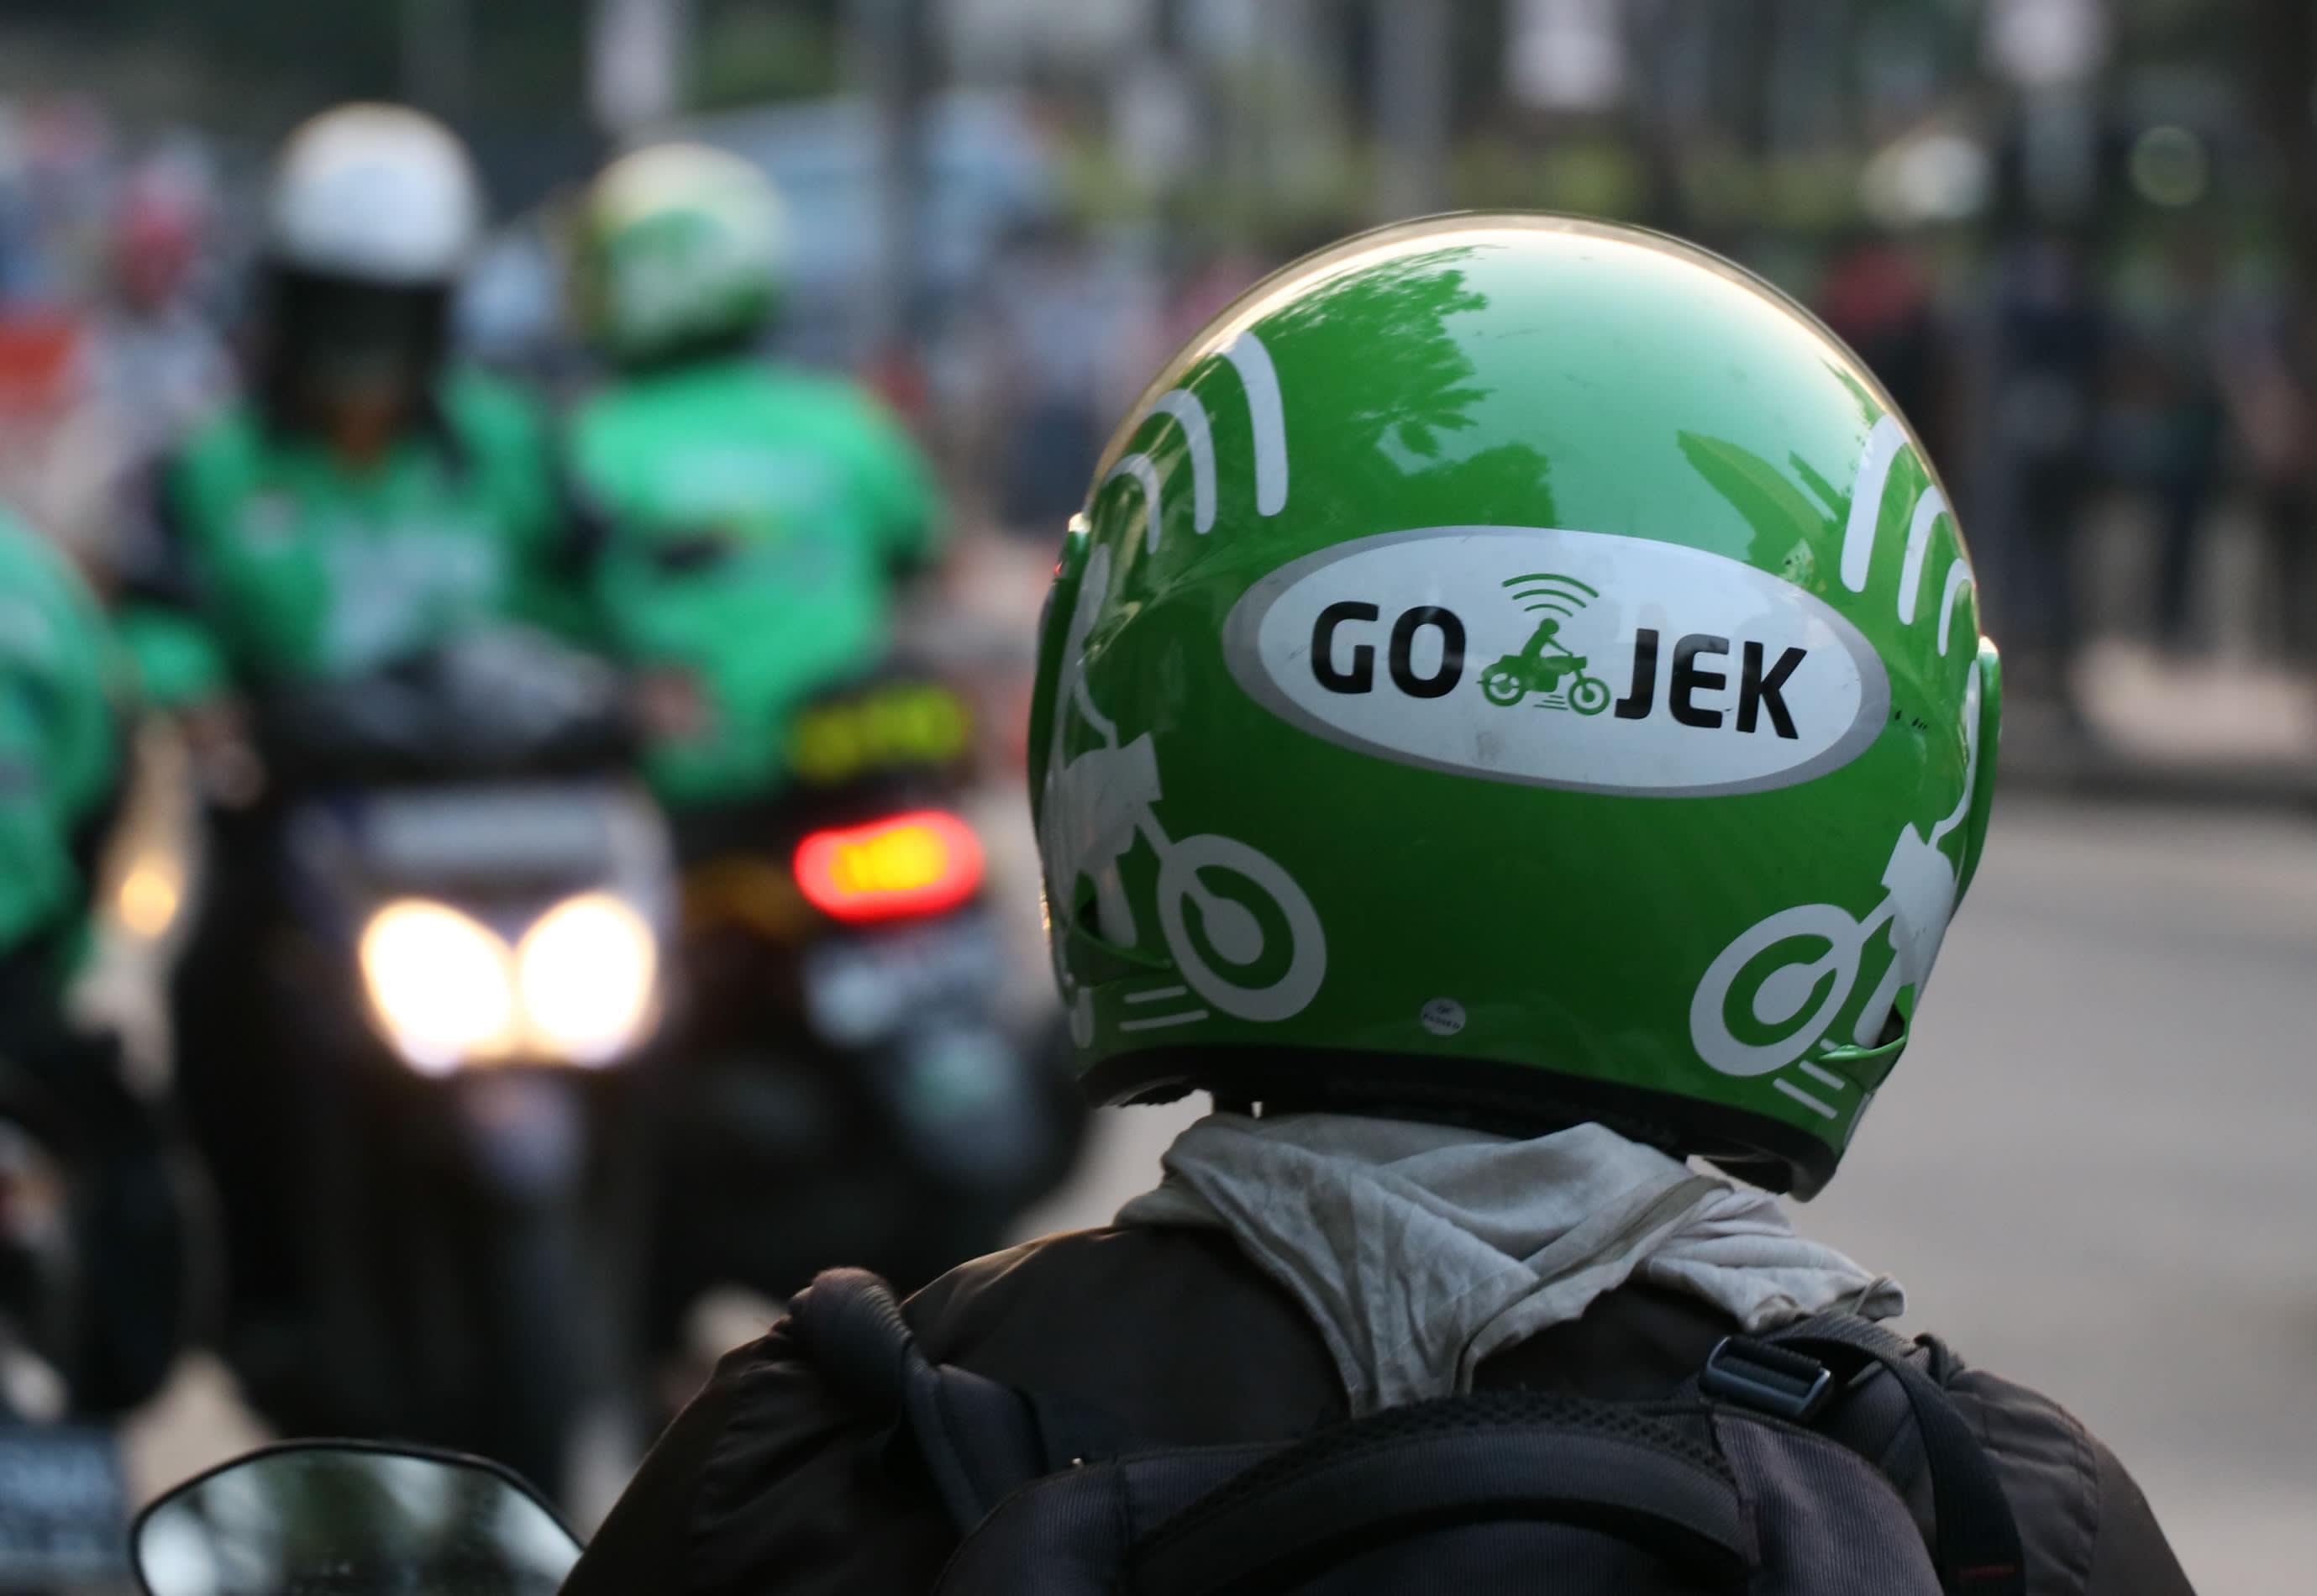 Go-Jek To Start Providing Content